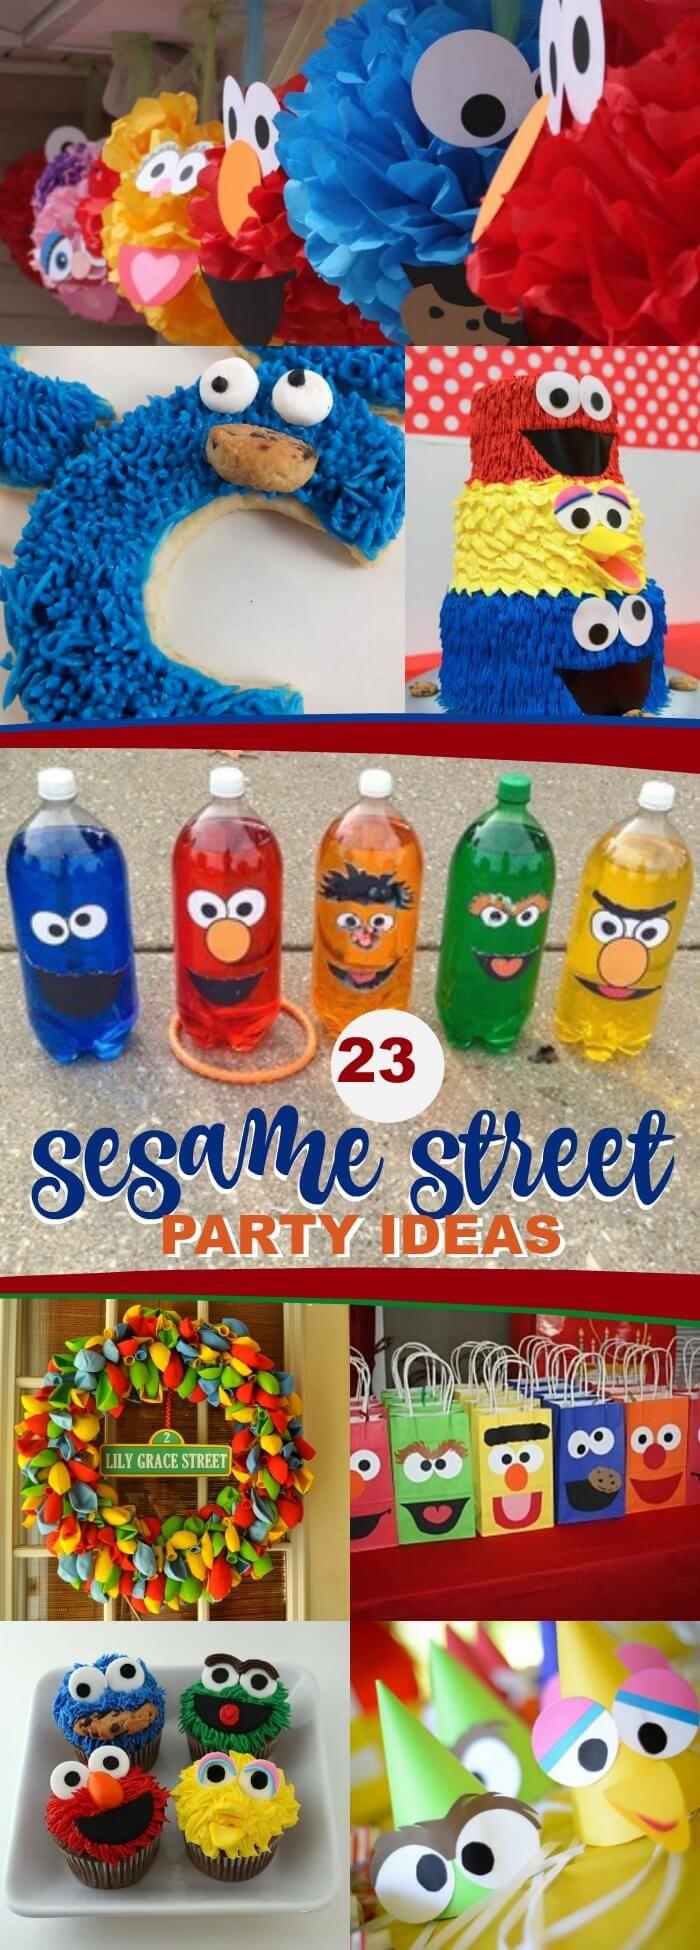 23 Sensational Sesame Street Party Ideas via @spaceshipslb